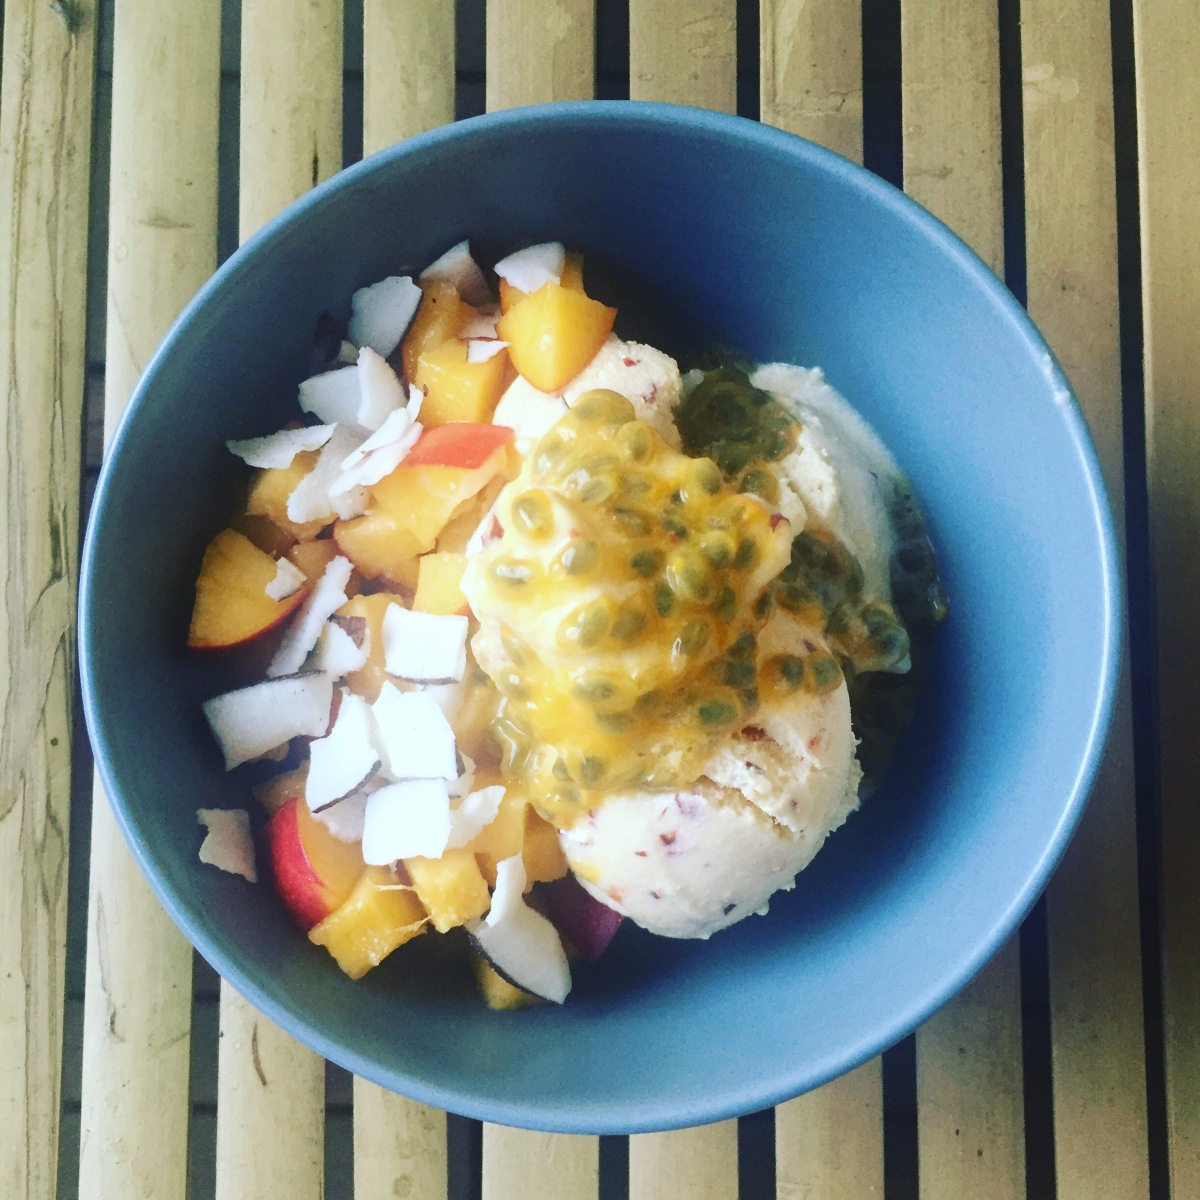 Nectarine and passion fruit icecream